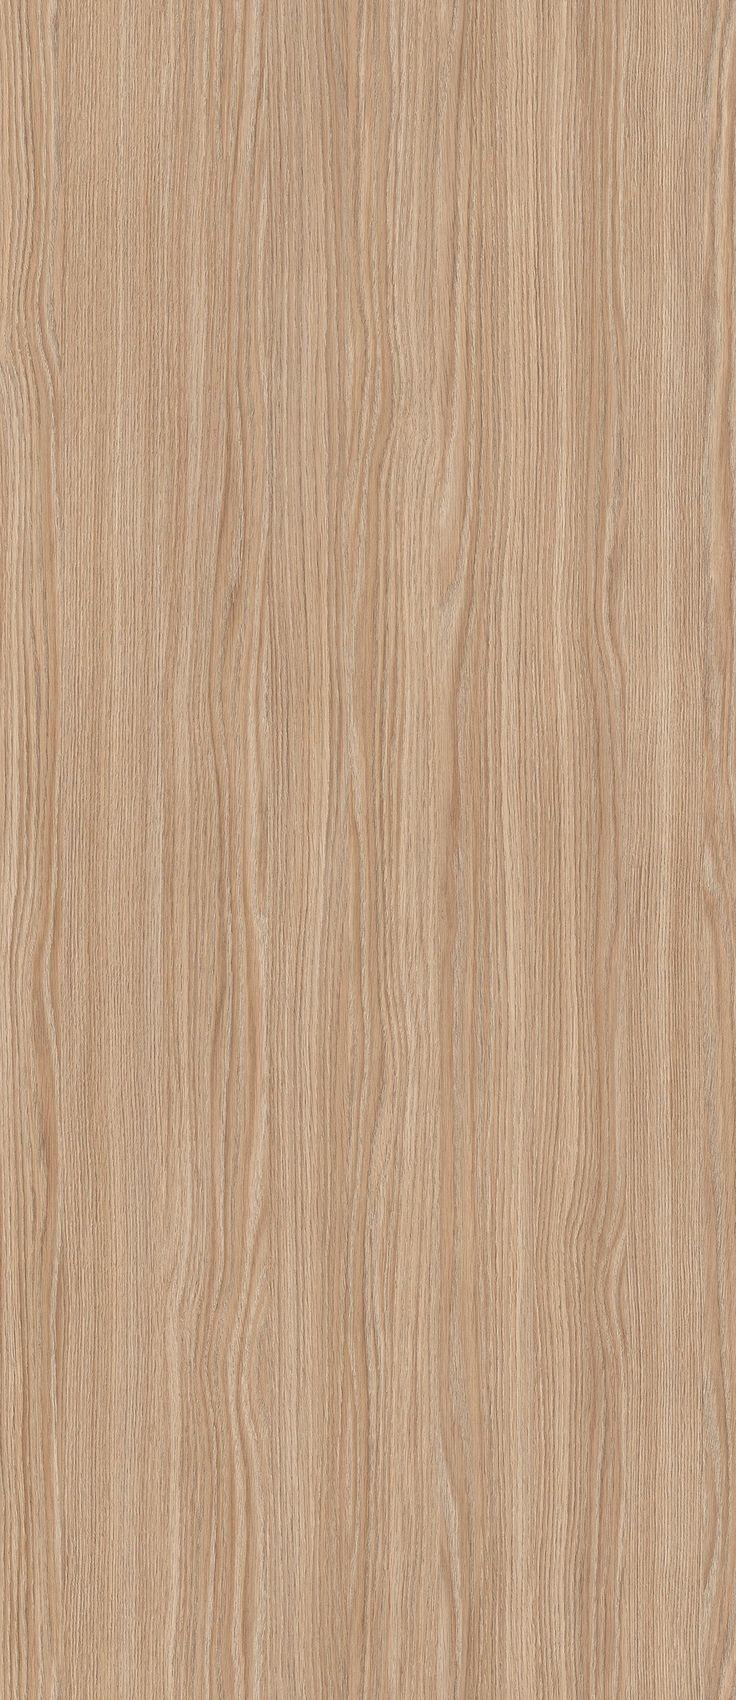 http://www.resopal.de/compact-hpl/decors/finn-oak-4414-60